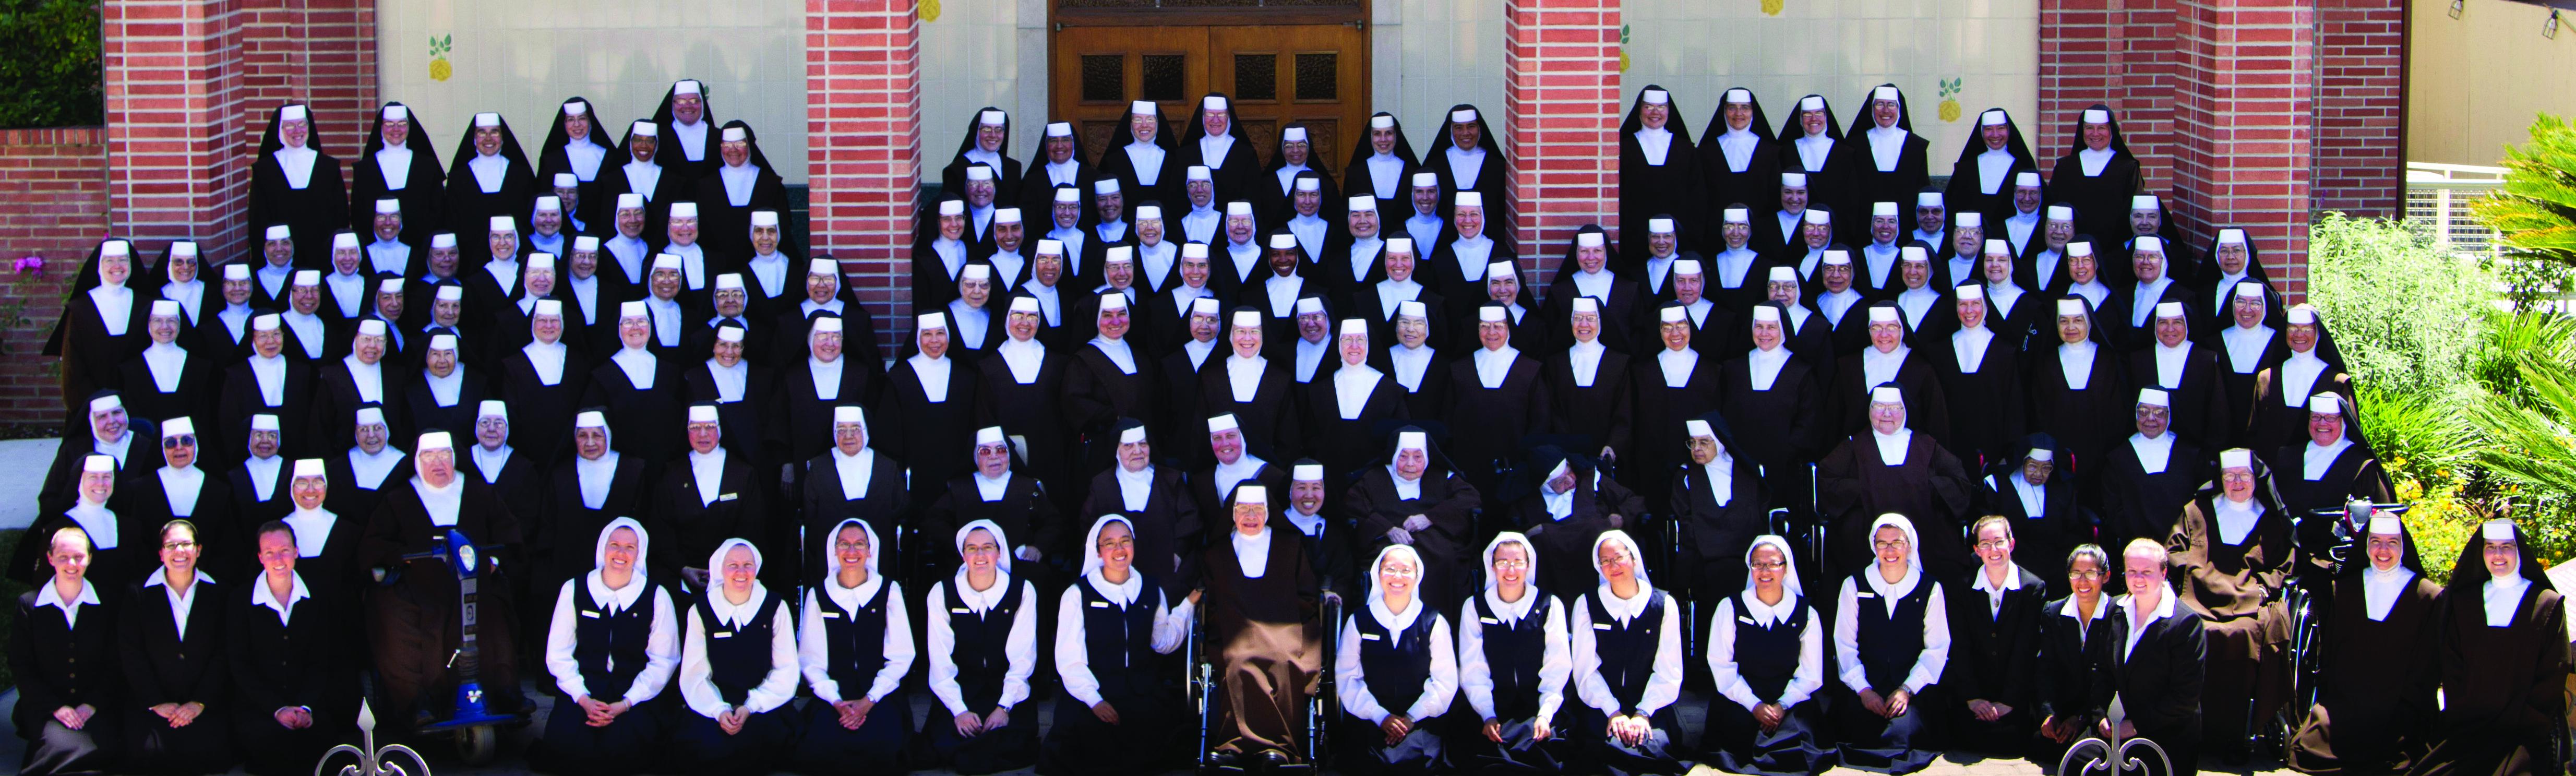 Carmelite Sisters Community